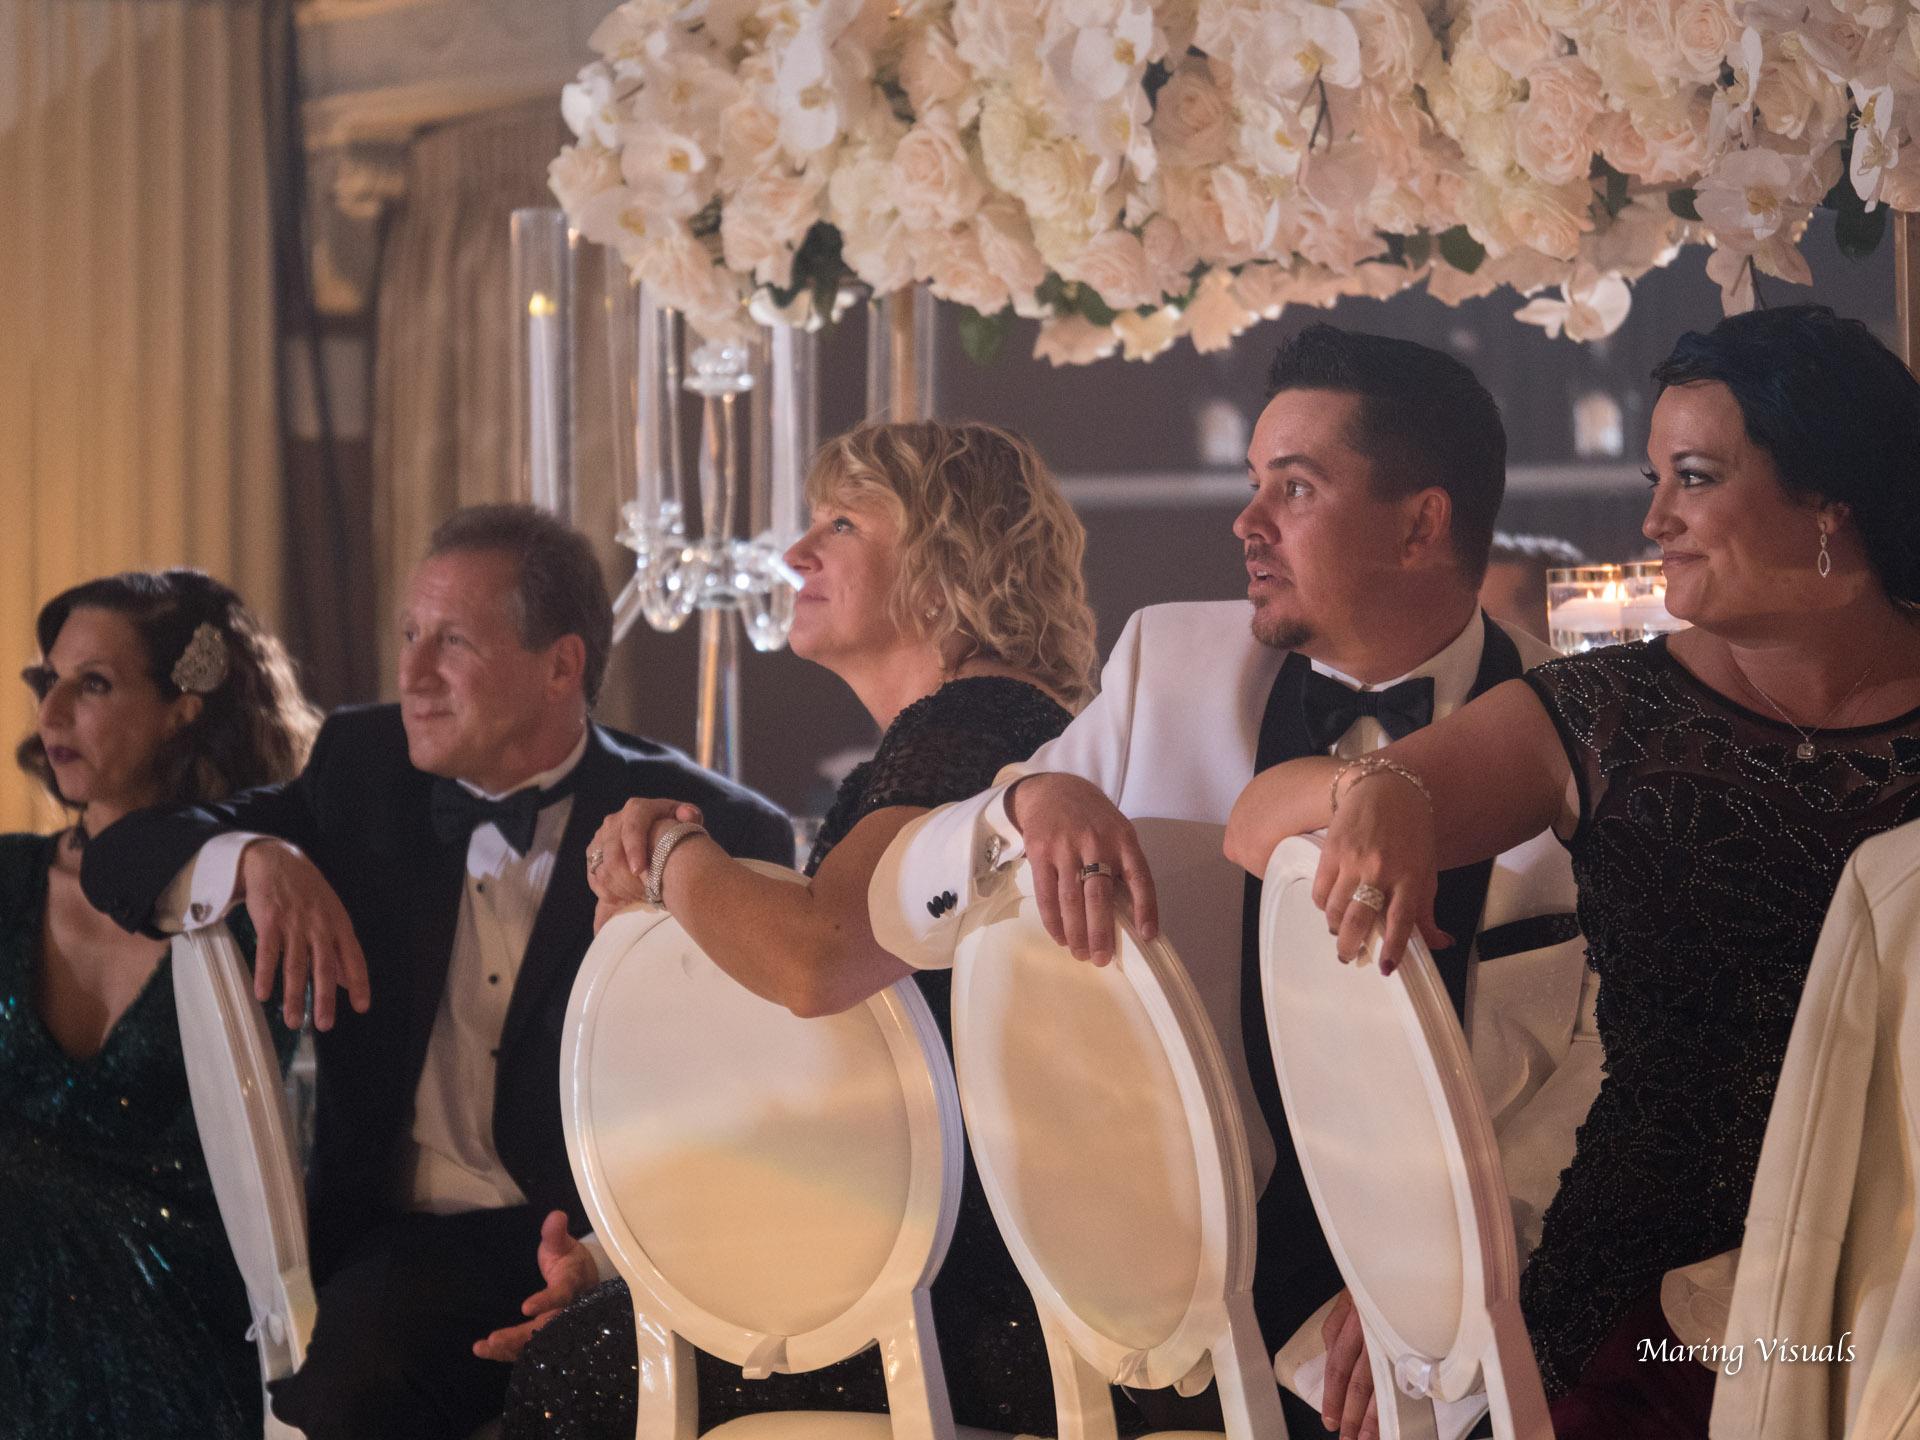 David Tutera Weddings by Maring Visuals 00565.jpg